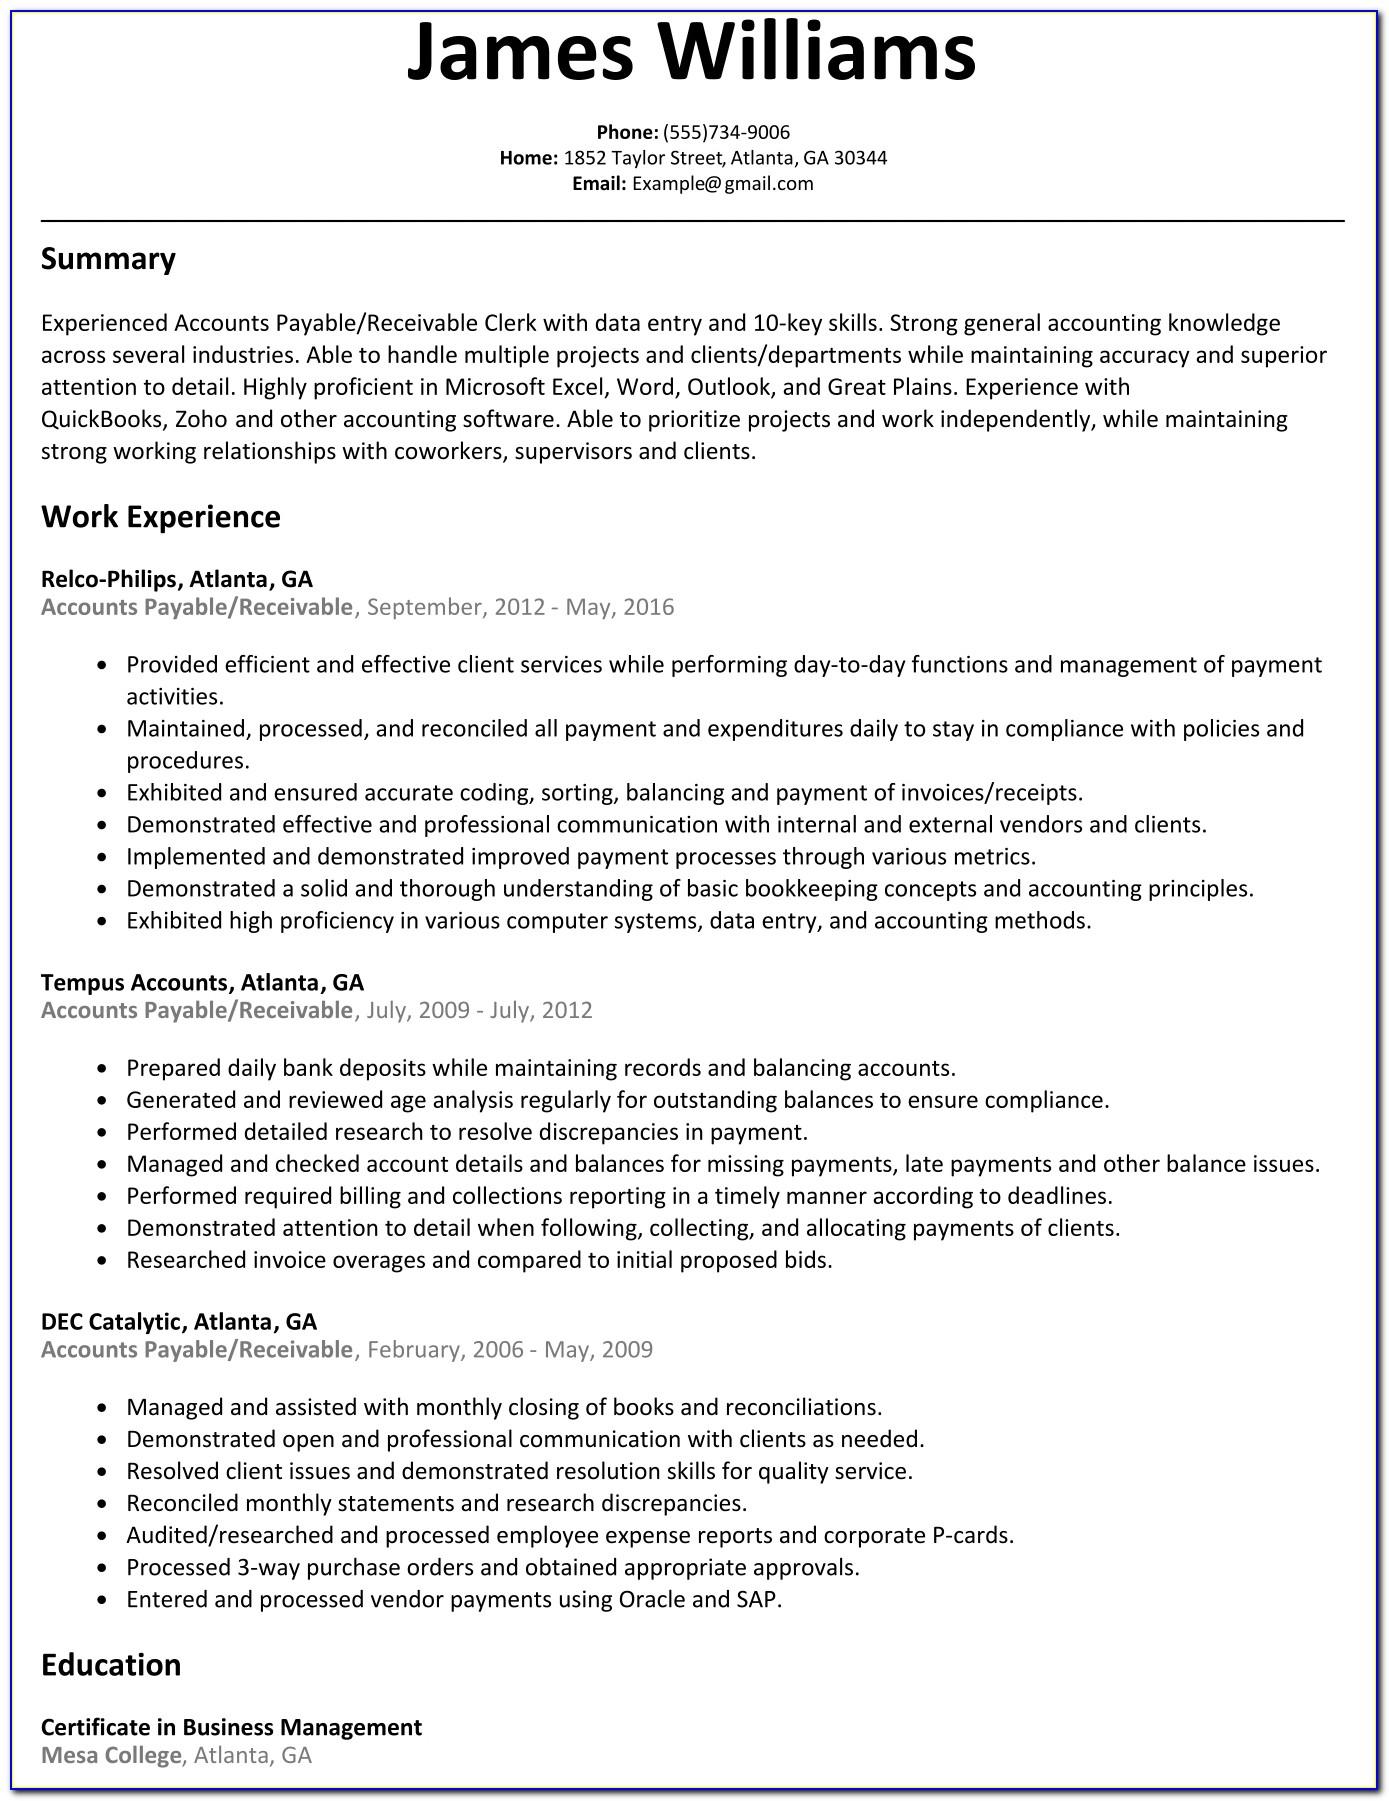 Accounts Payable Executive Resume Format